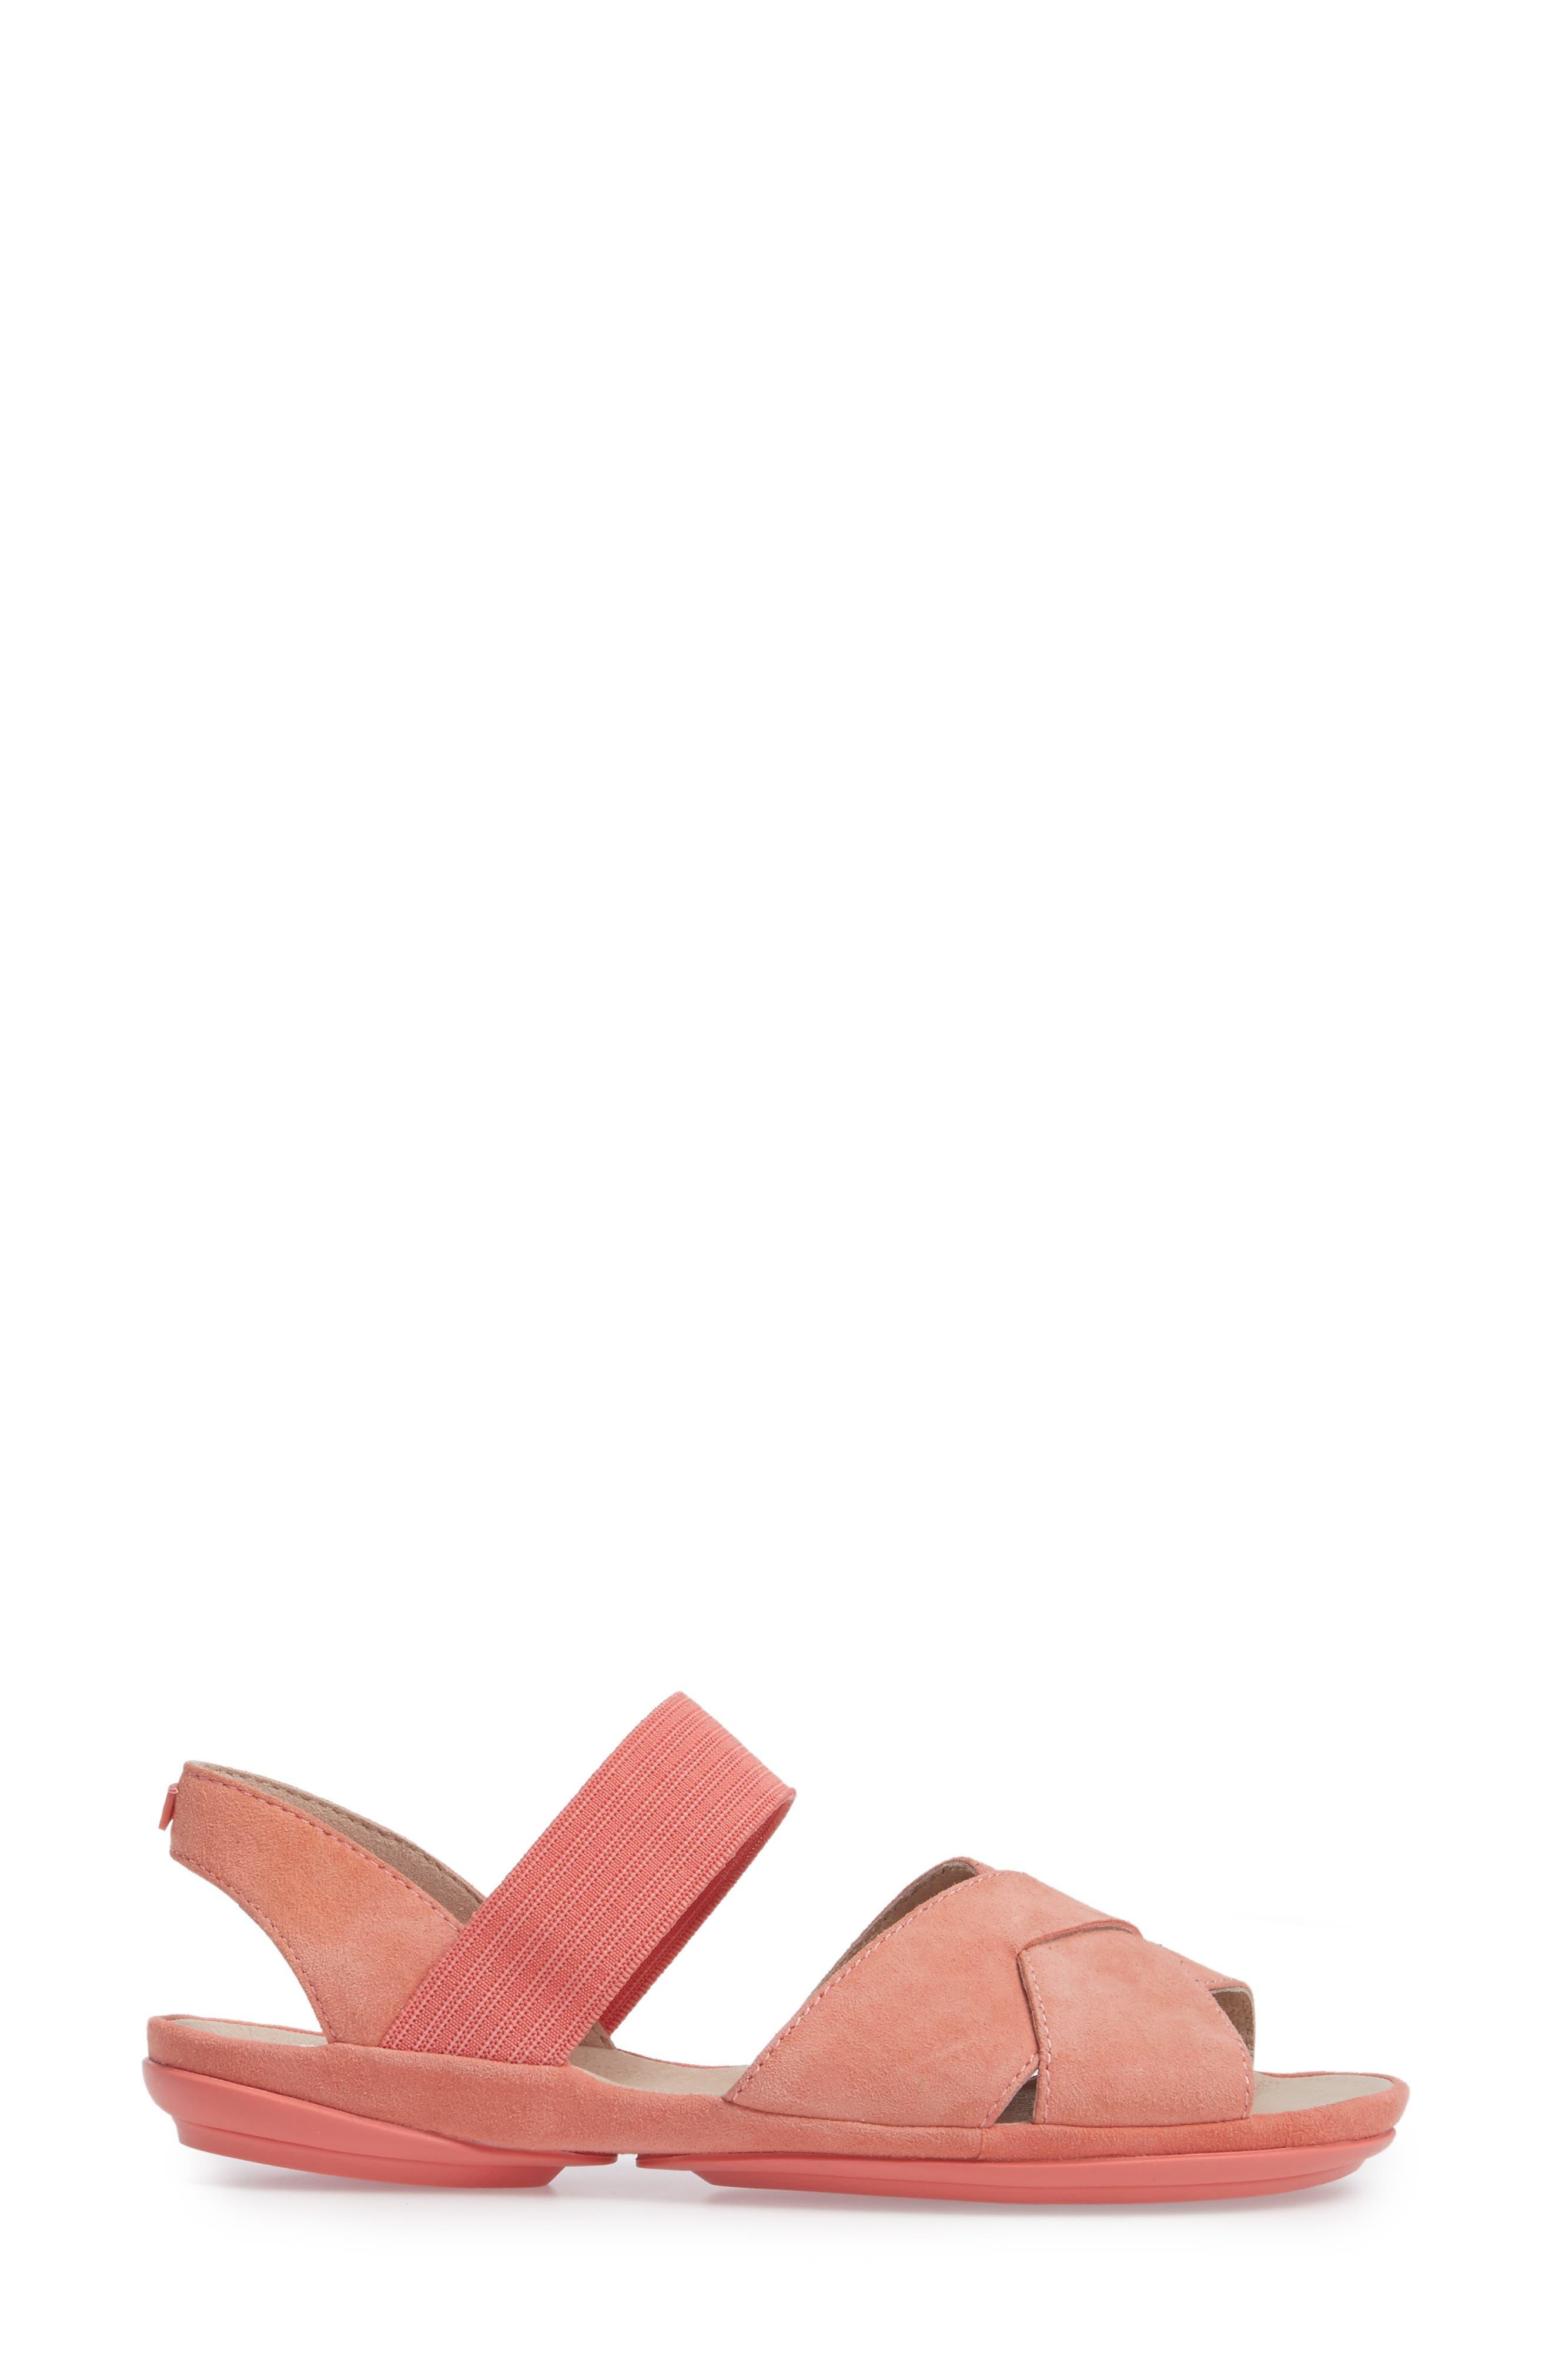 Right Nina Flat Cross Strap Sandal,                             Alternate thumbnail 3, color,                             Medium Pink Leather